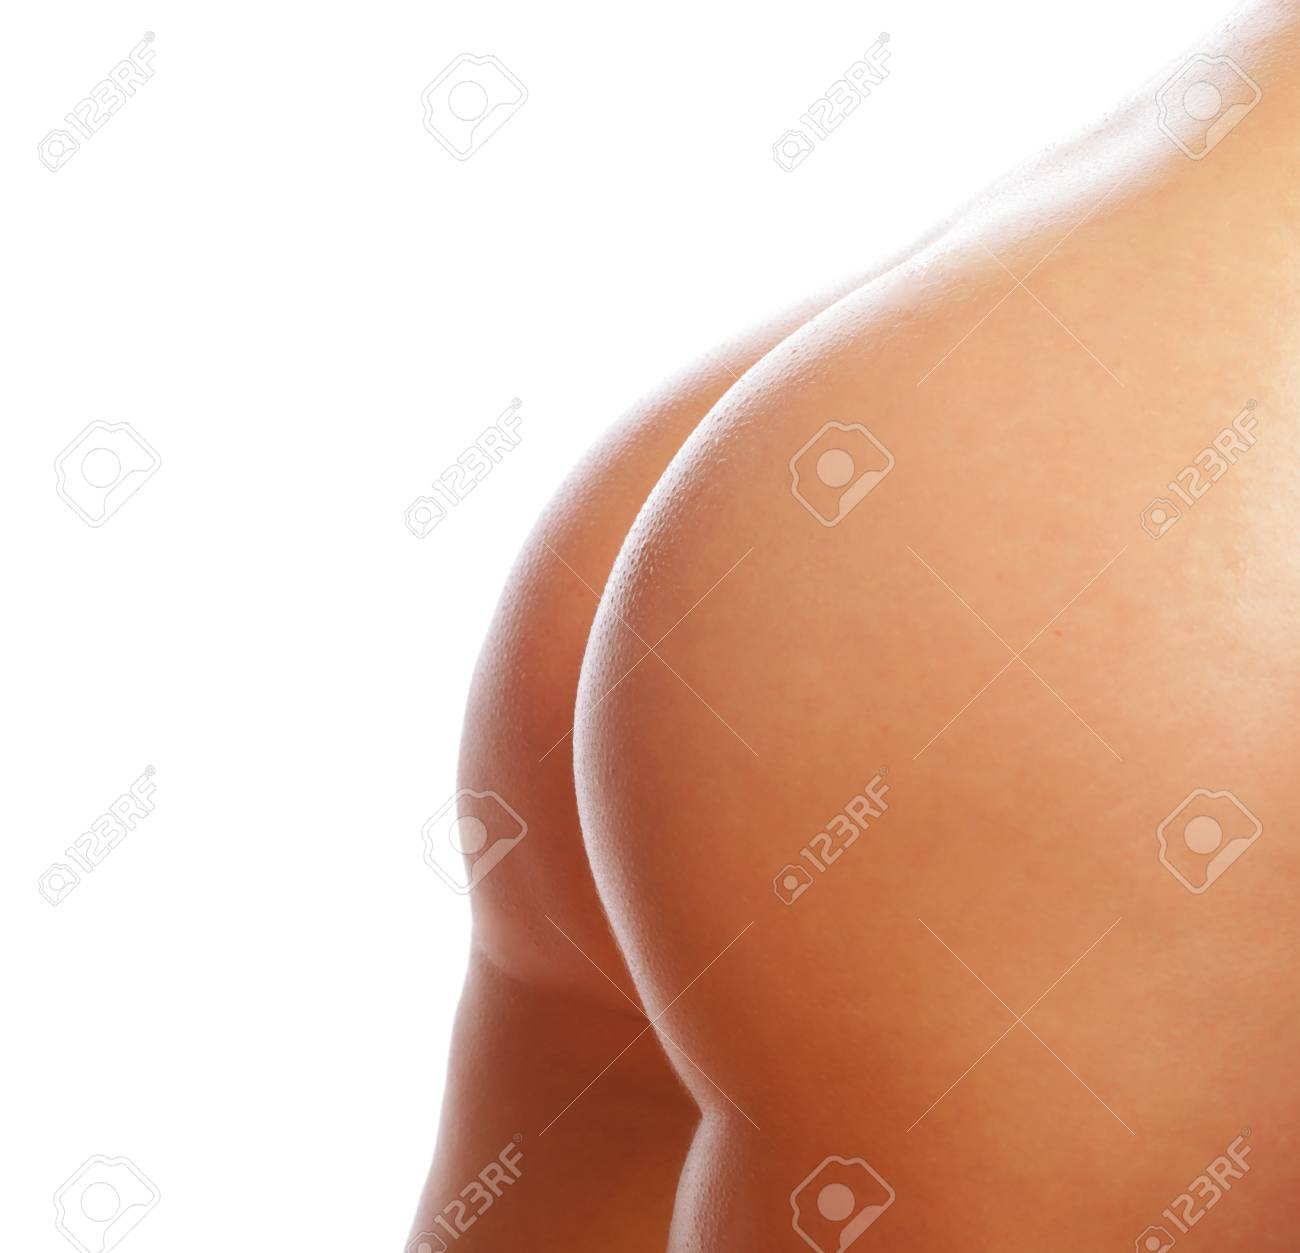 Cartoon hd sex